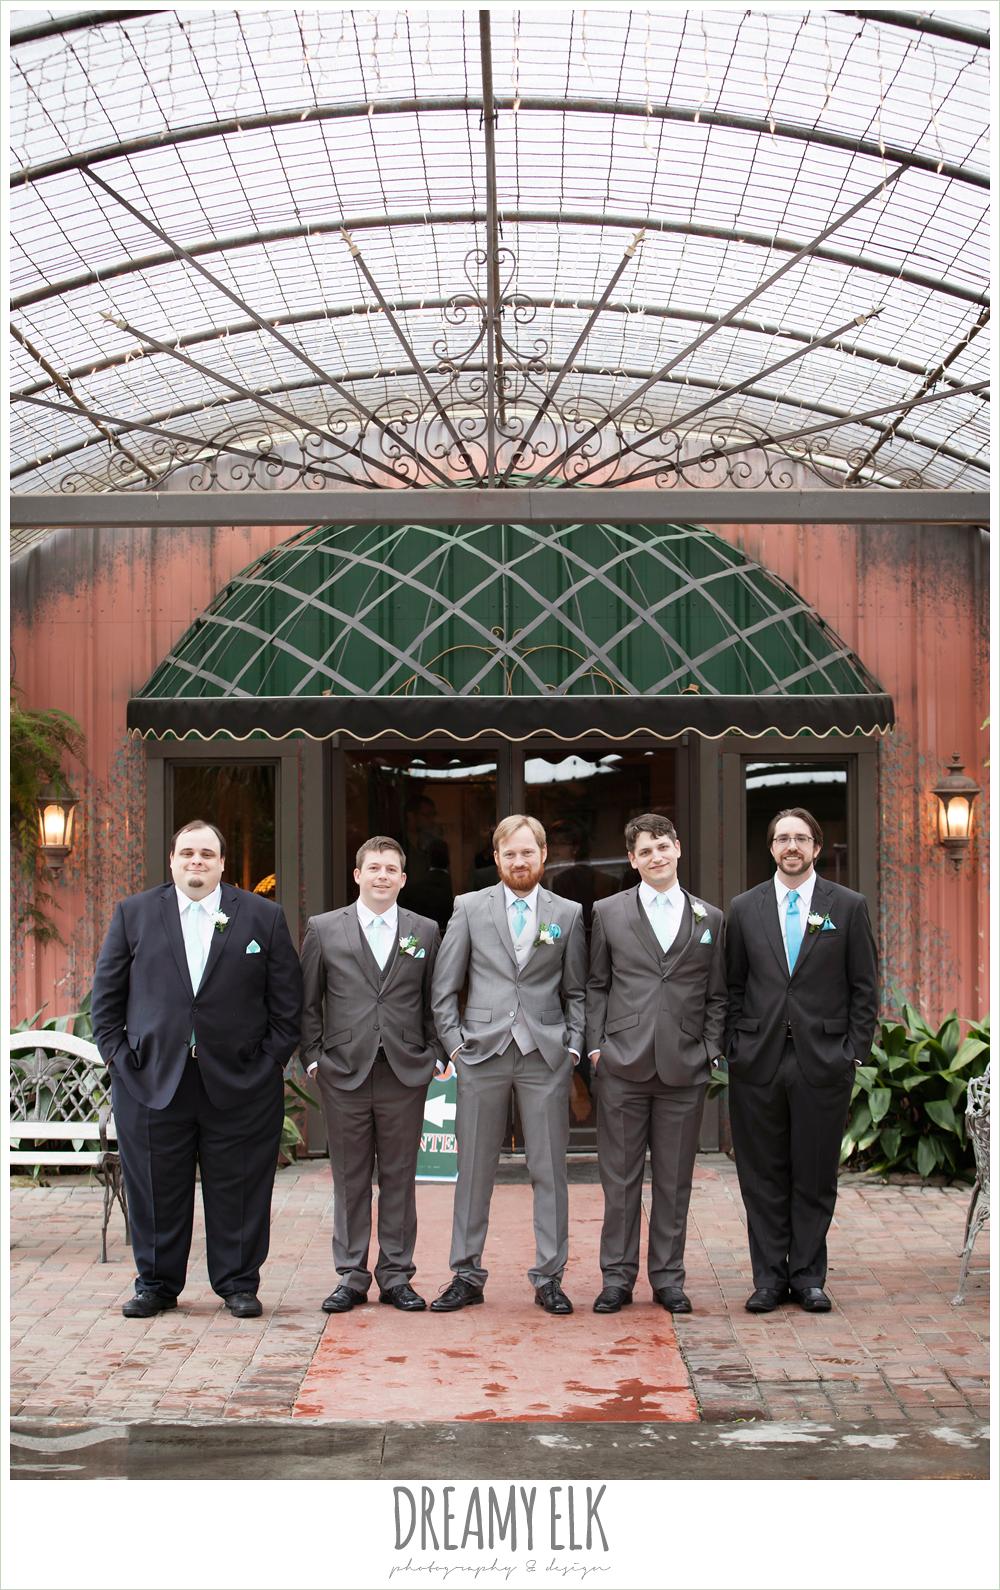 groom in gray suit, groomsmen in different suits, le jardin winter wedding {dreamy elk photography and design}